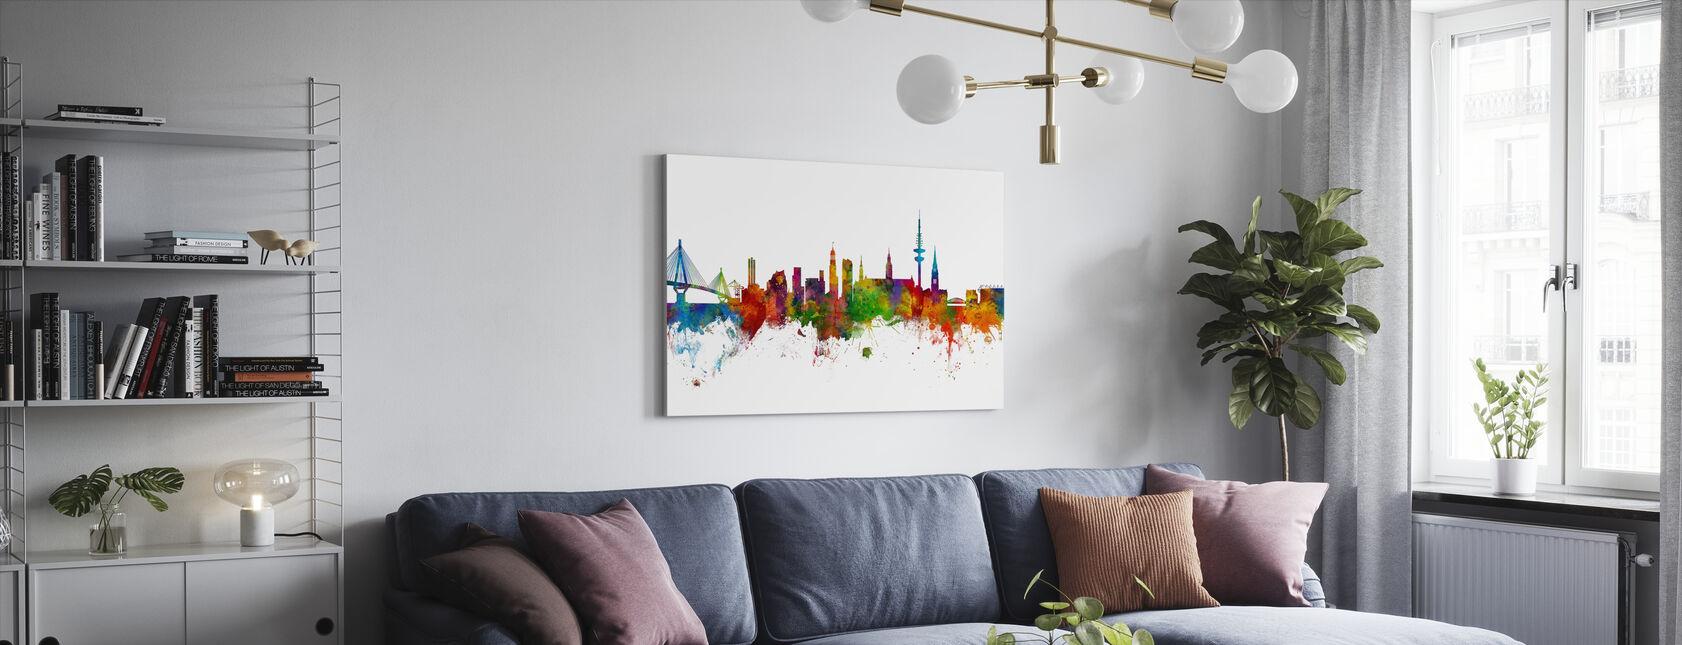 Hamburg Skyline - Leinwandbild - Wohnzimmer